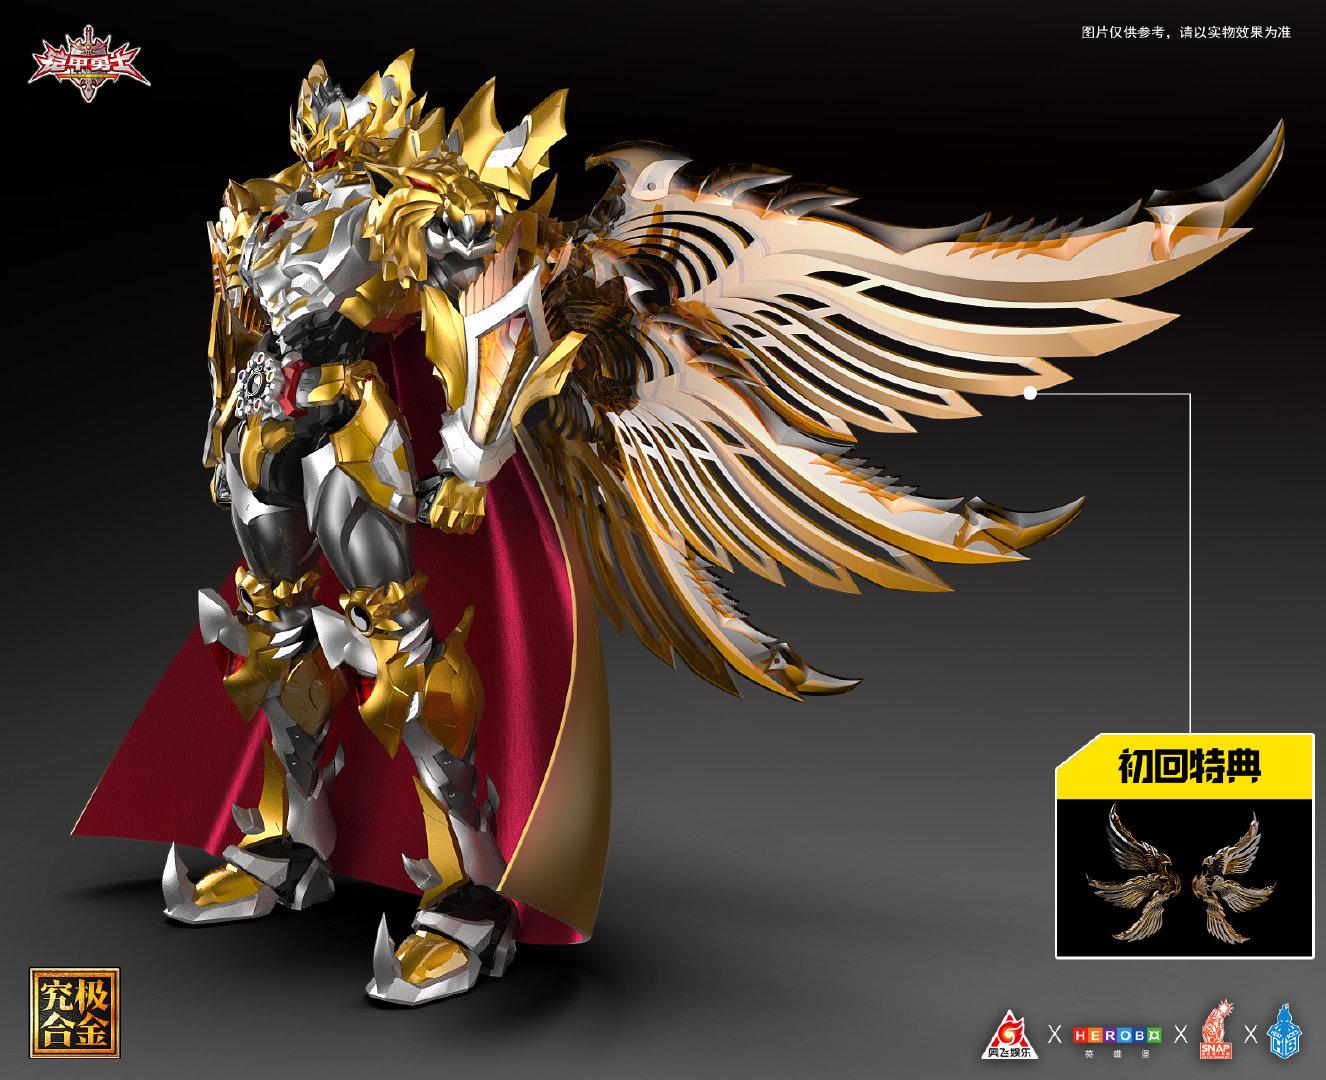 S535_Armor_hero_Emperor_032.jpg